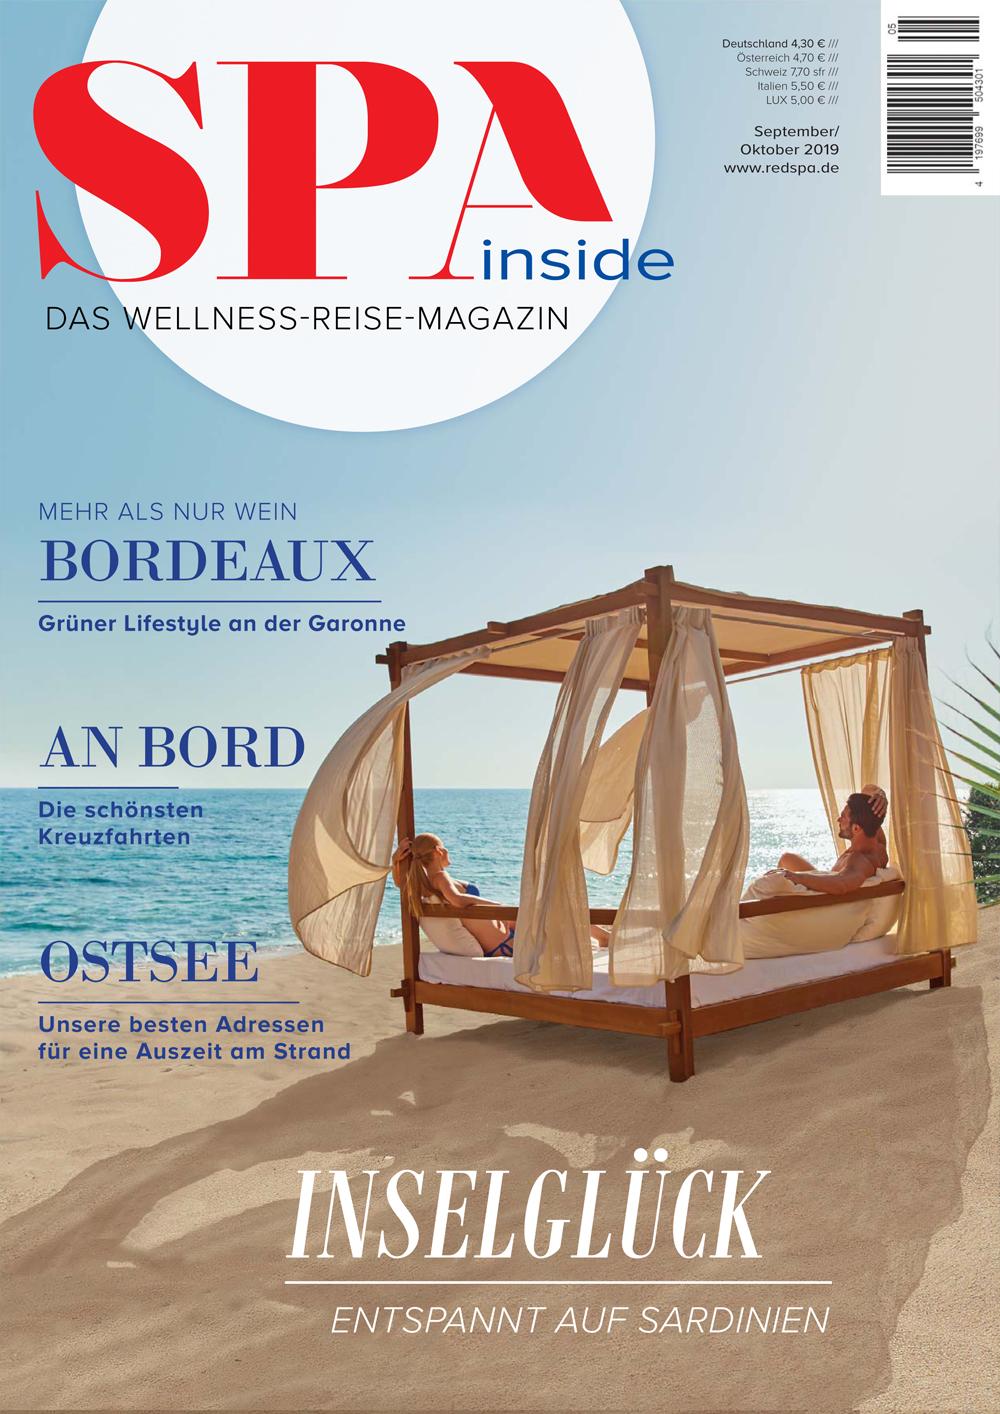 SPA inside - Ausgabe 05/2019